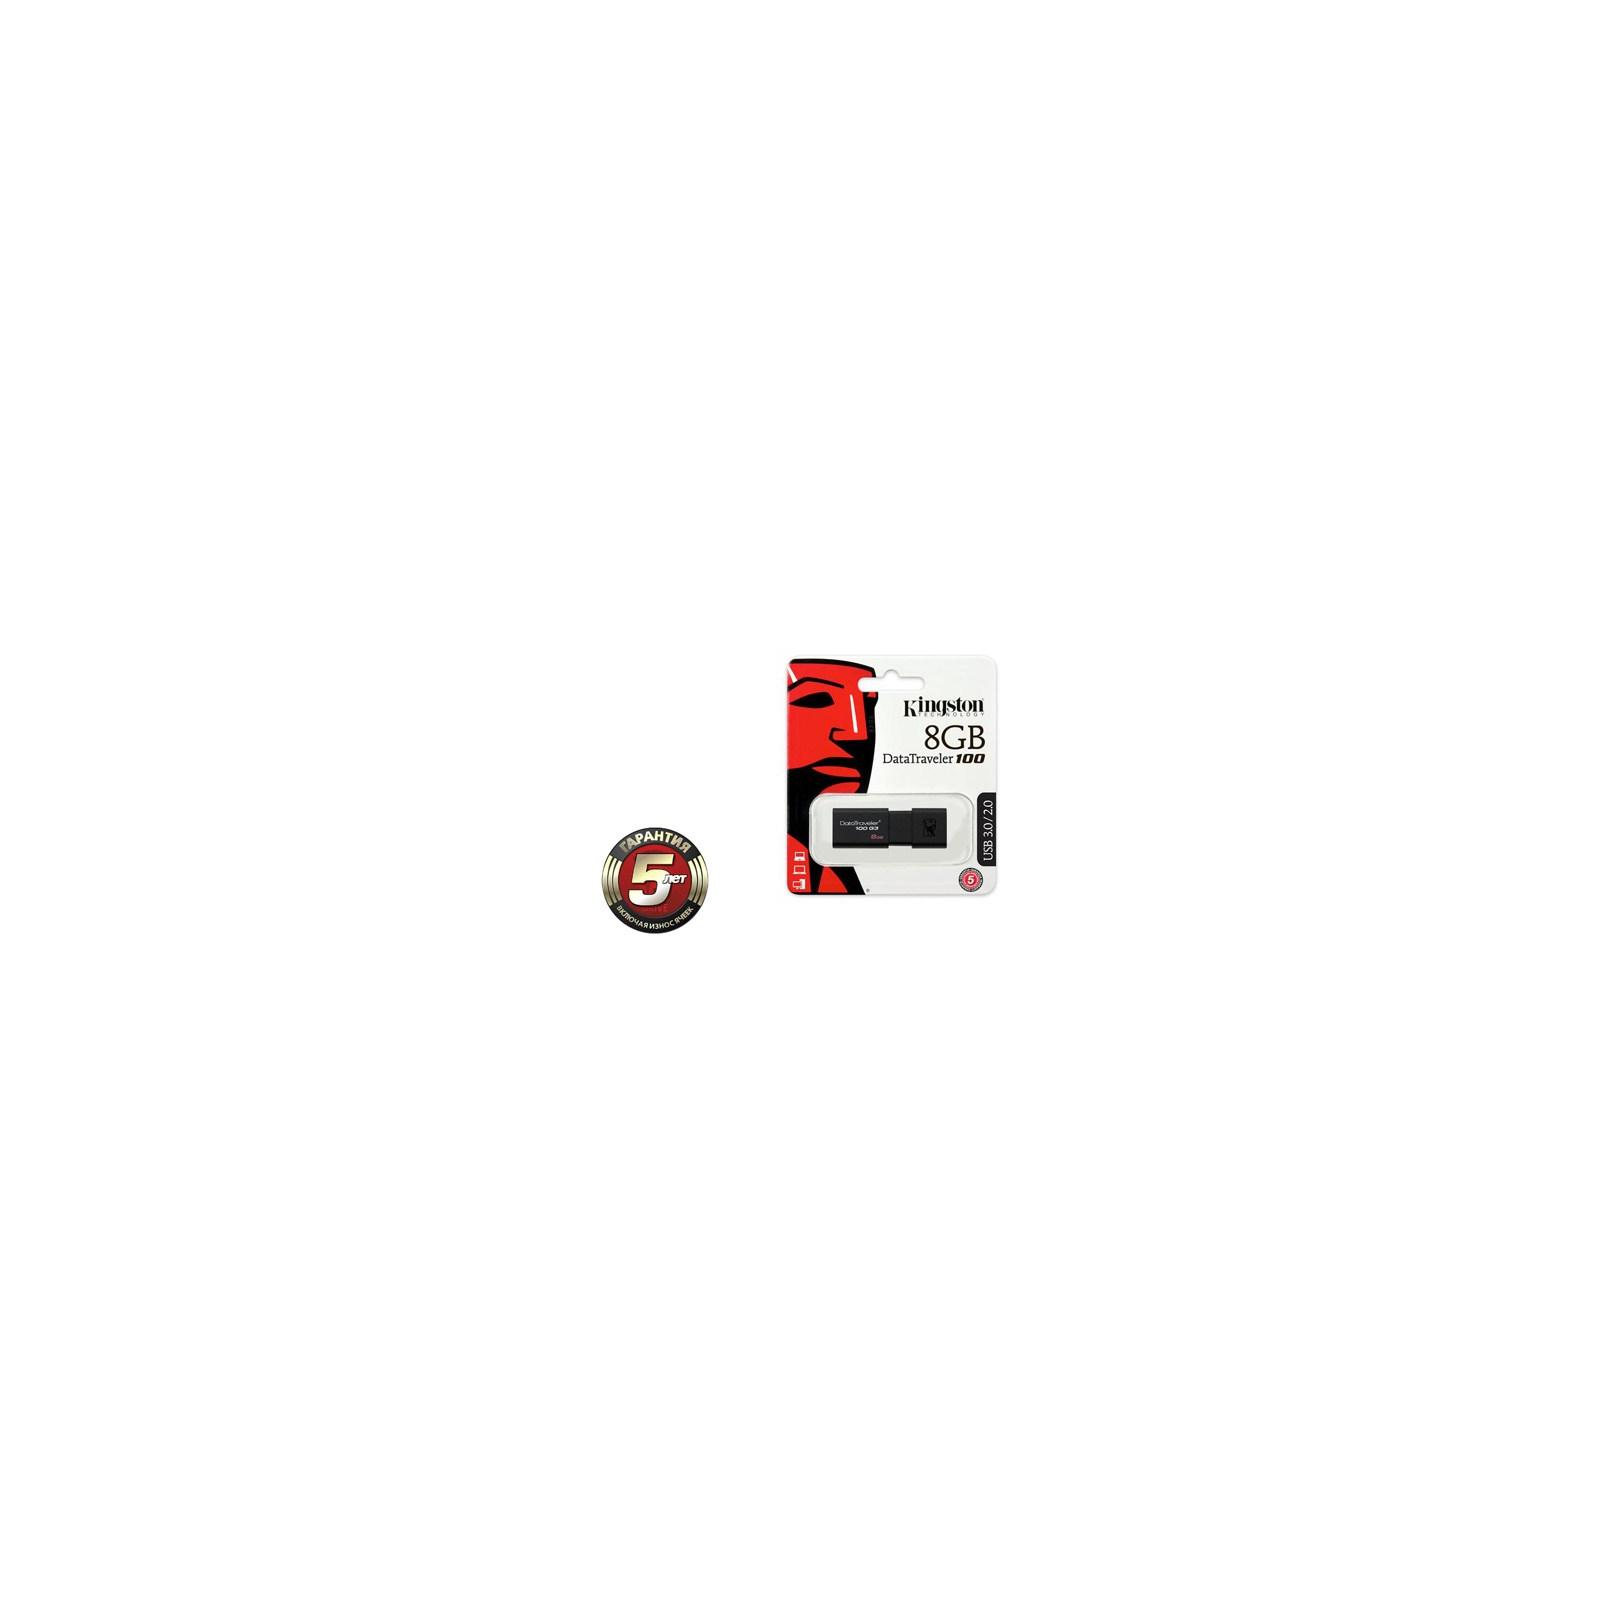 USB флеш накопитель Kingston 32Gb DataTraveler 100 Generation 3 USB3.0 (DT100G3/32GB) изображение 3